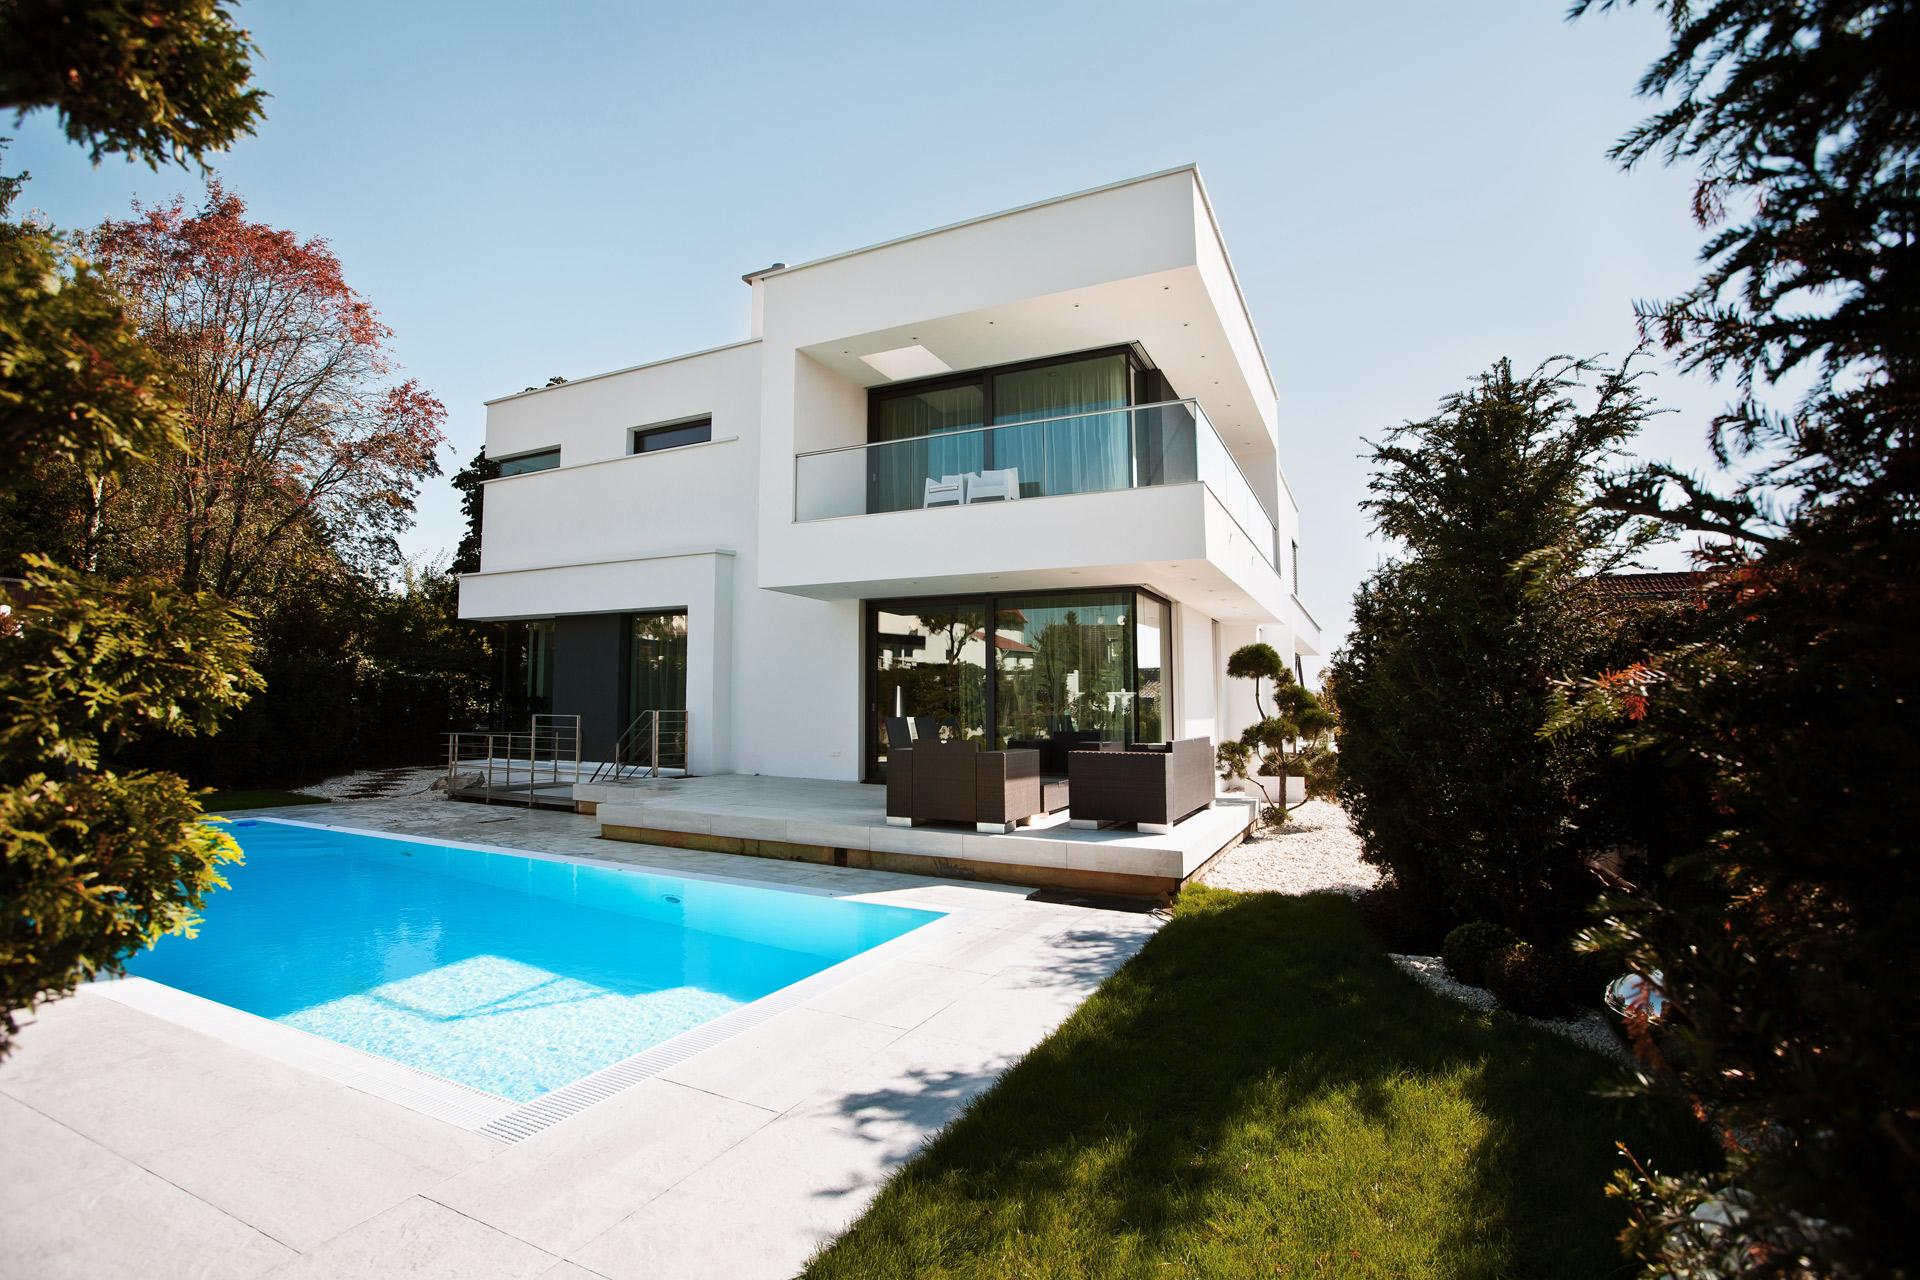 Architektur-001-Bauhaus-Sc